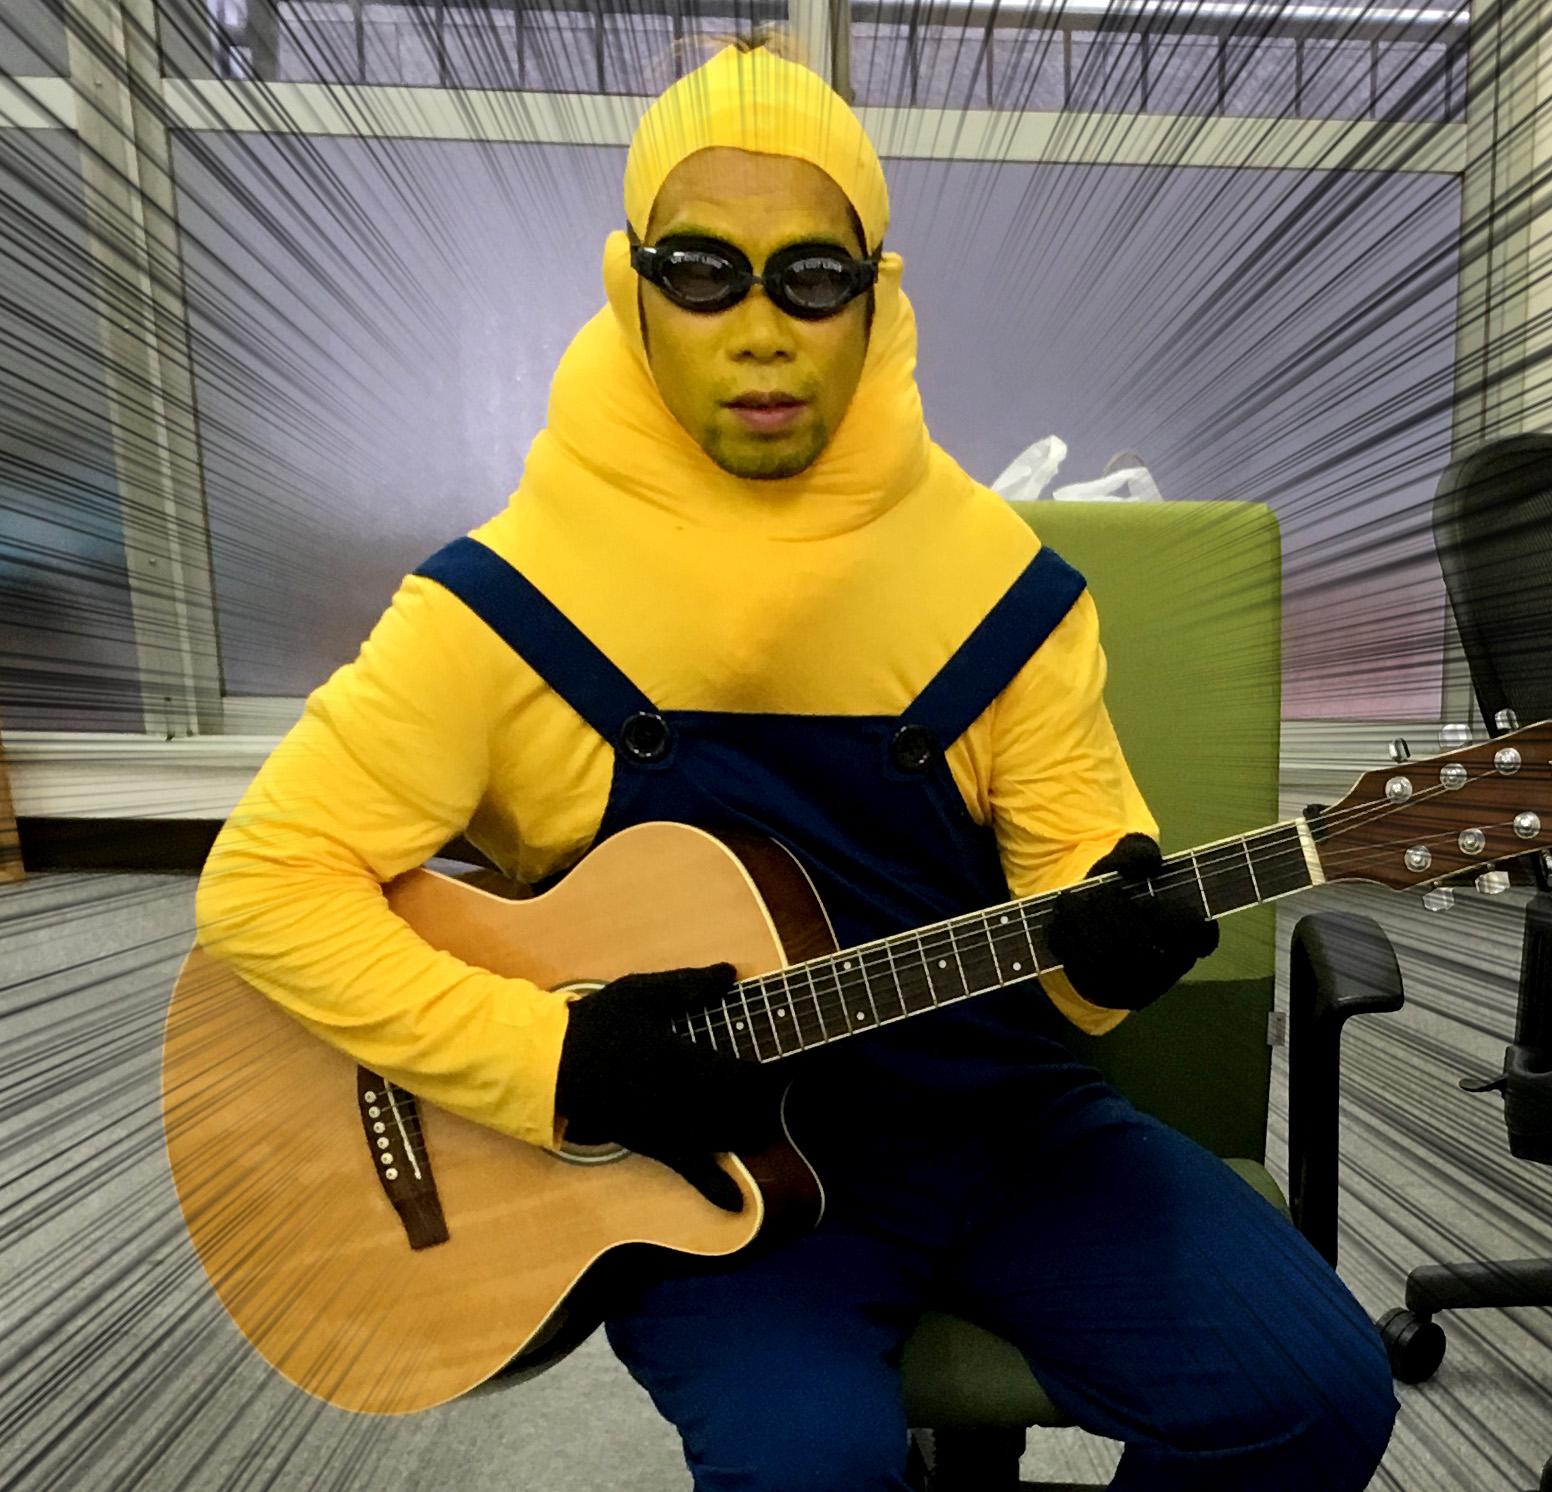 bananam9